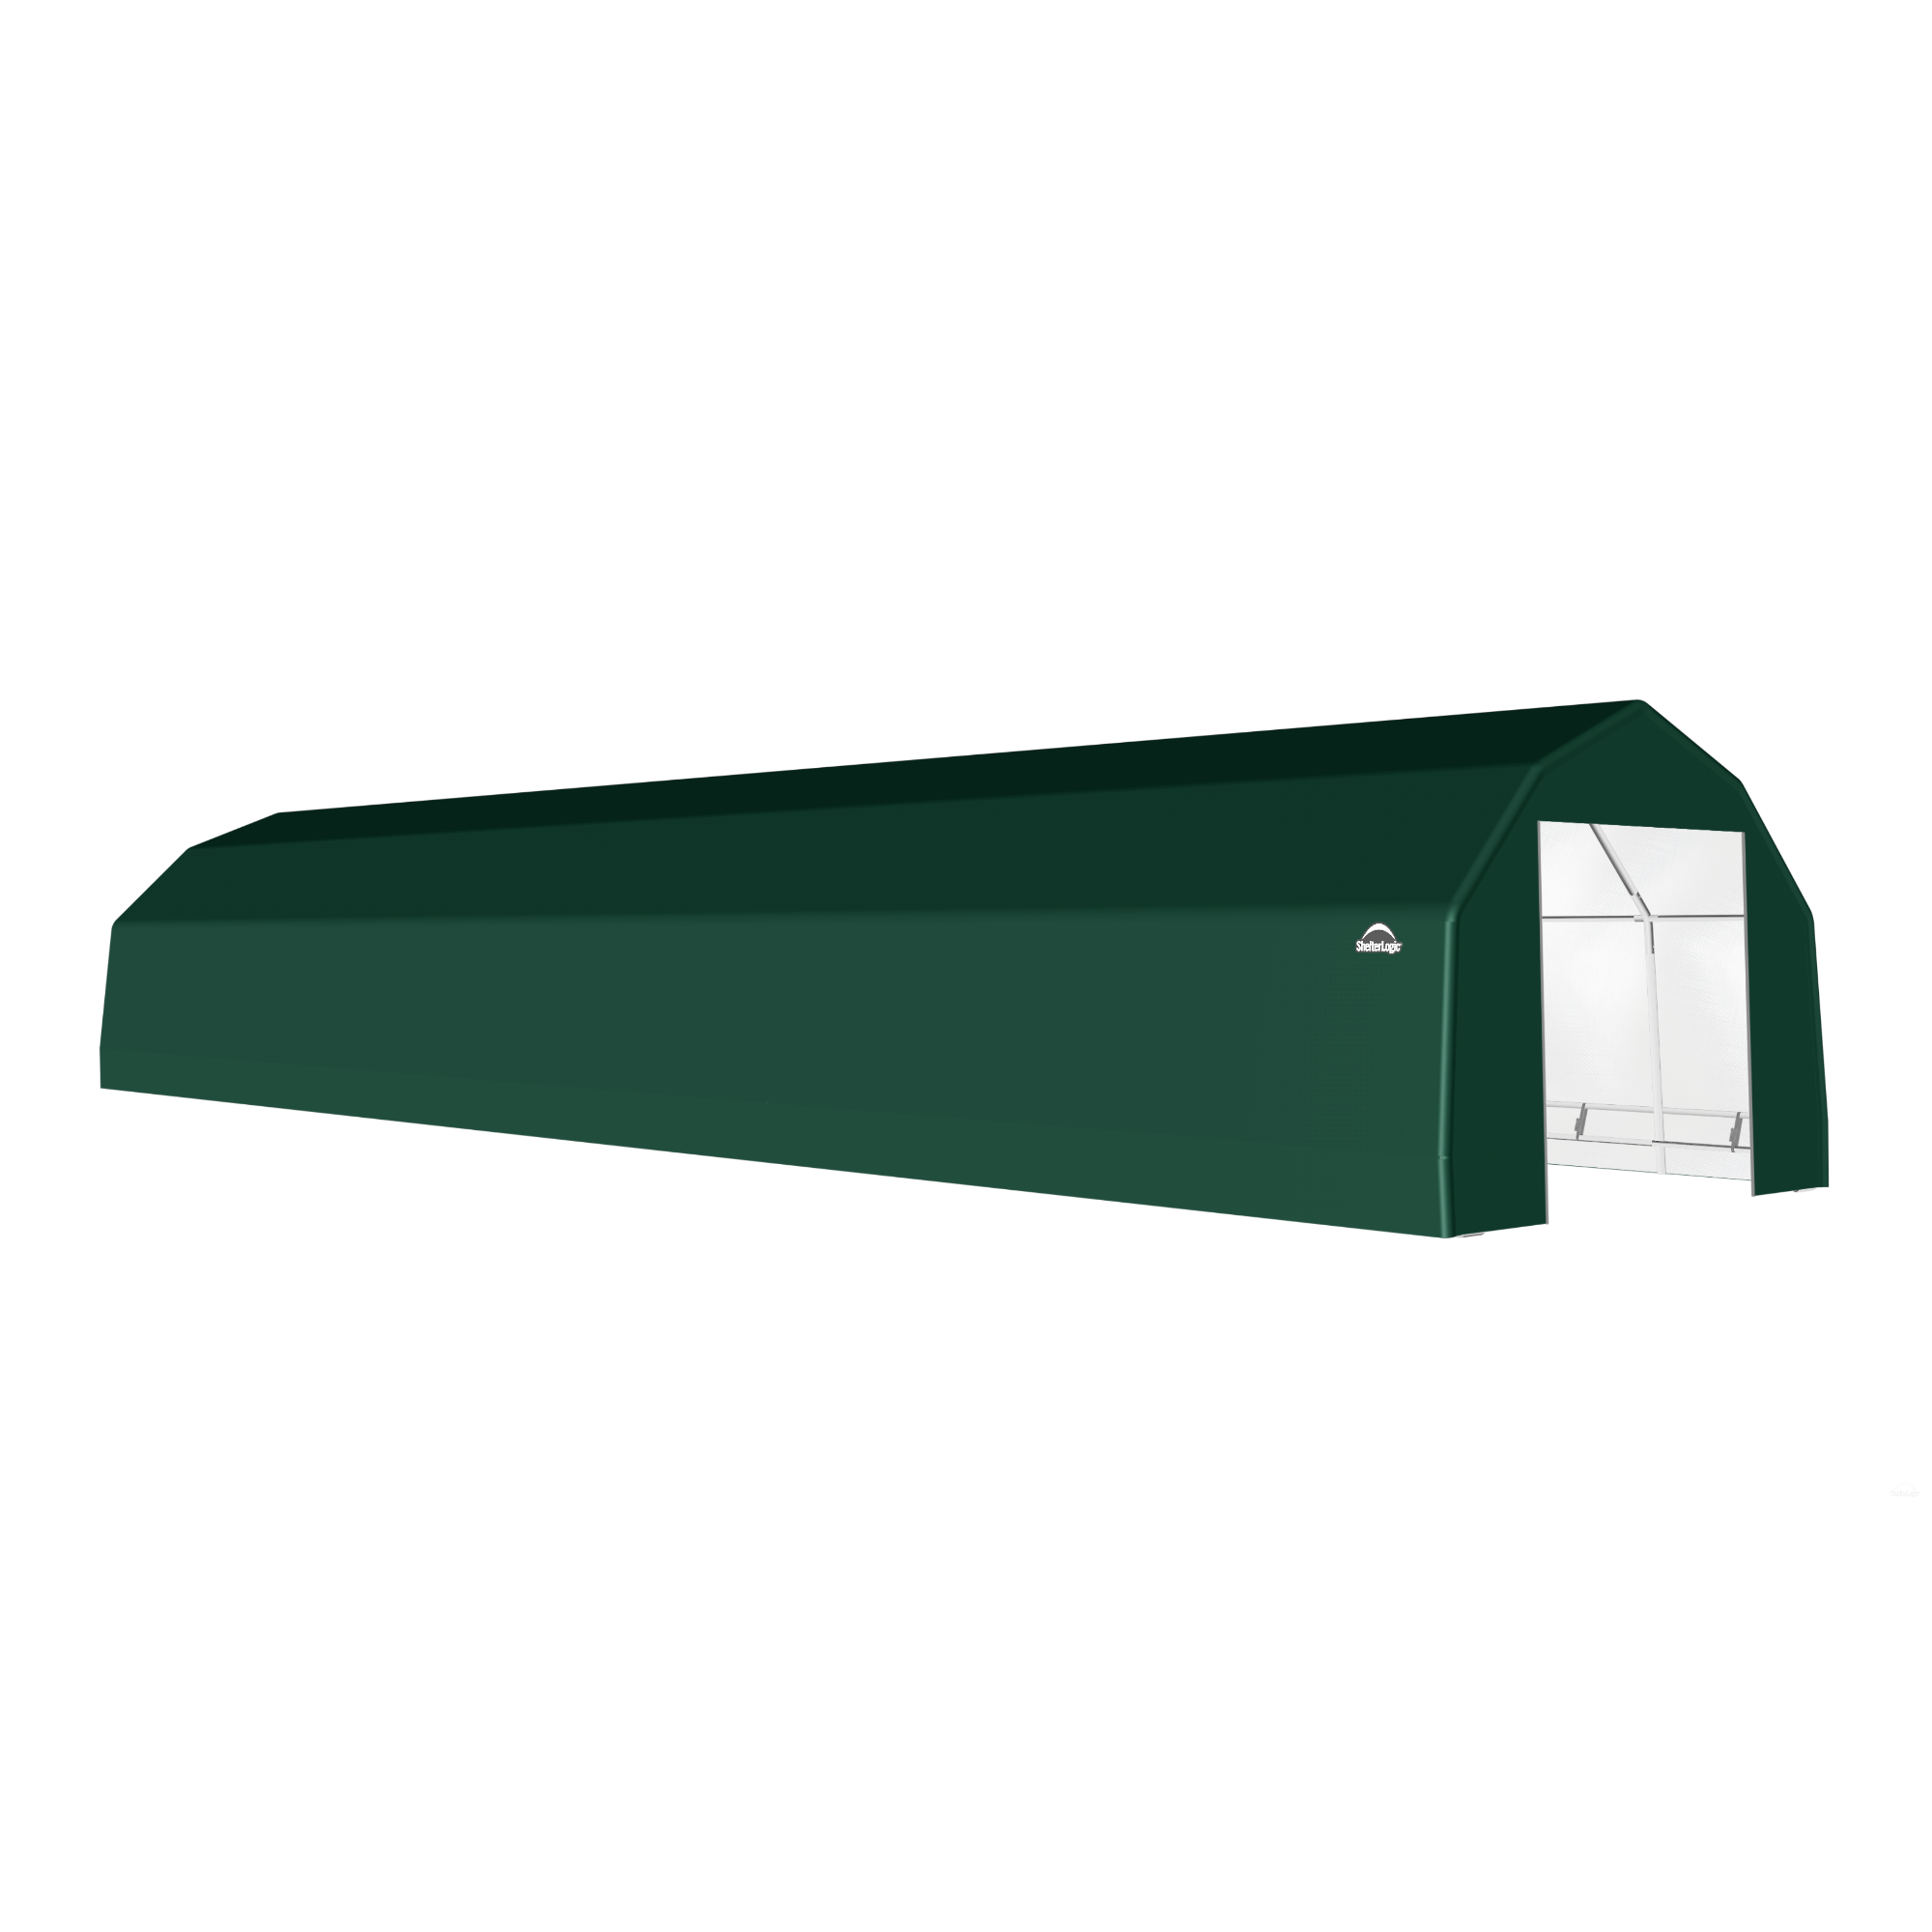 SP Barn 15X68X11 Green 14 oz PE Shelter